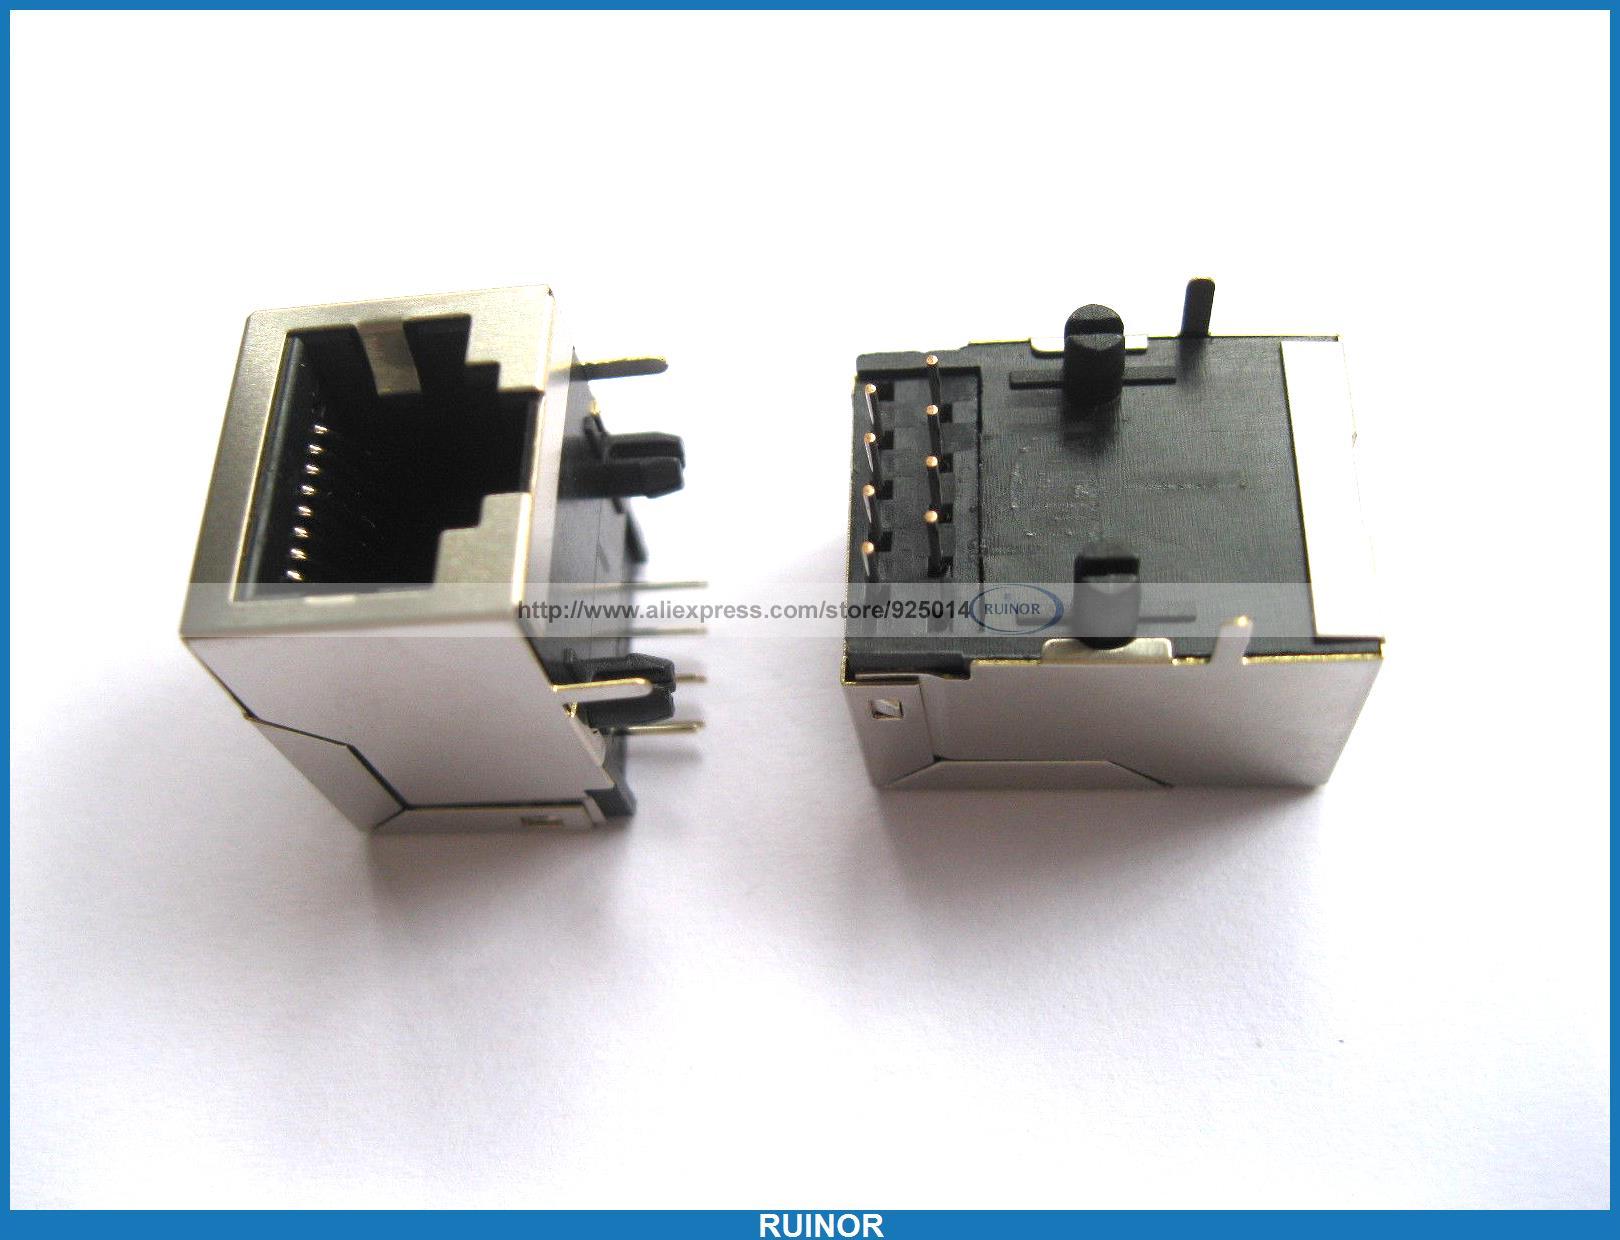 50 Pcs RJ45 Modular Network PCB Jack 59 8P LAN Connector 24 pcs rj45 modular network pcb jack 56 8p w led 4 ports